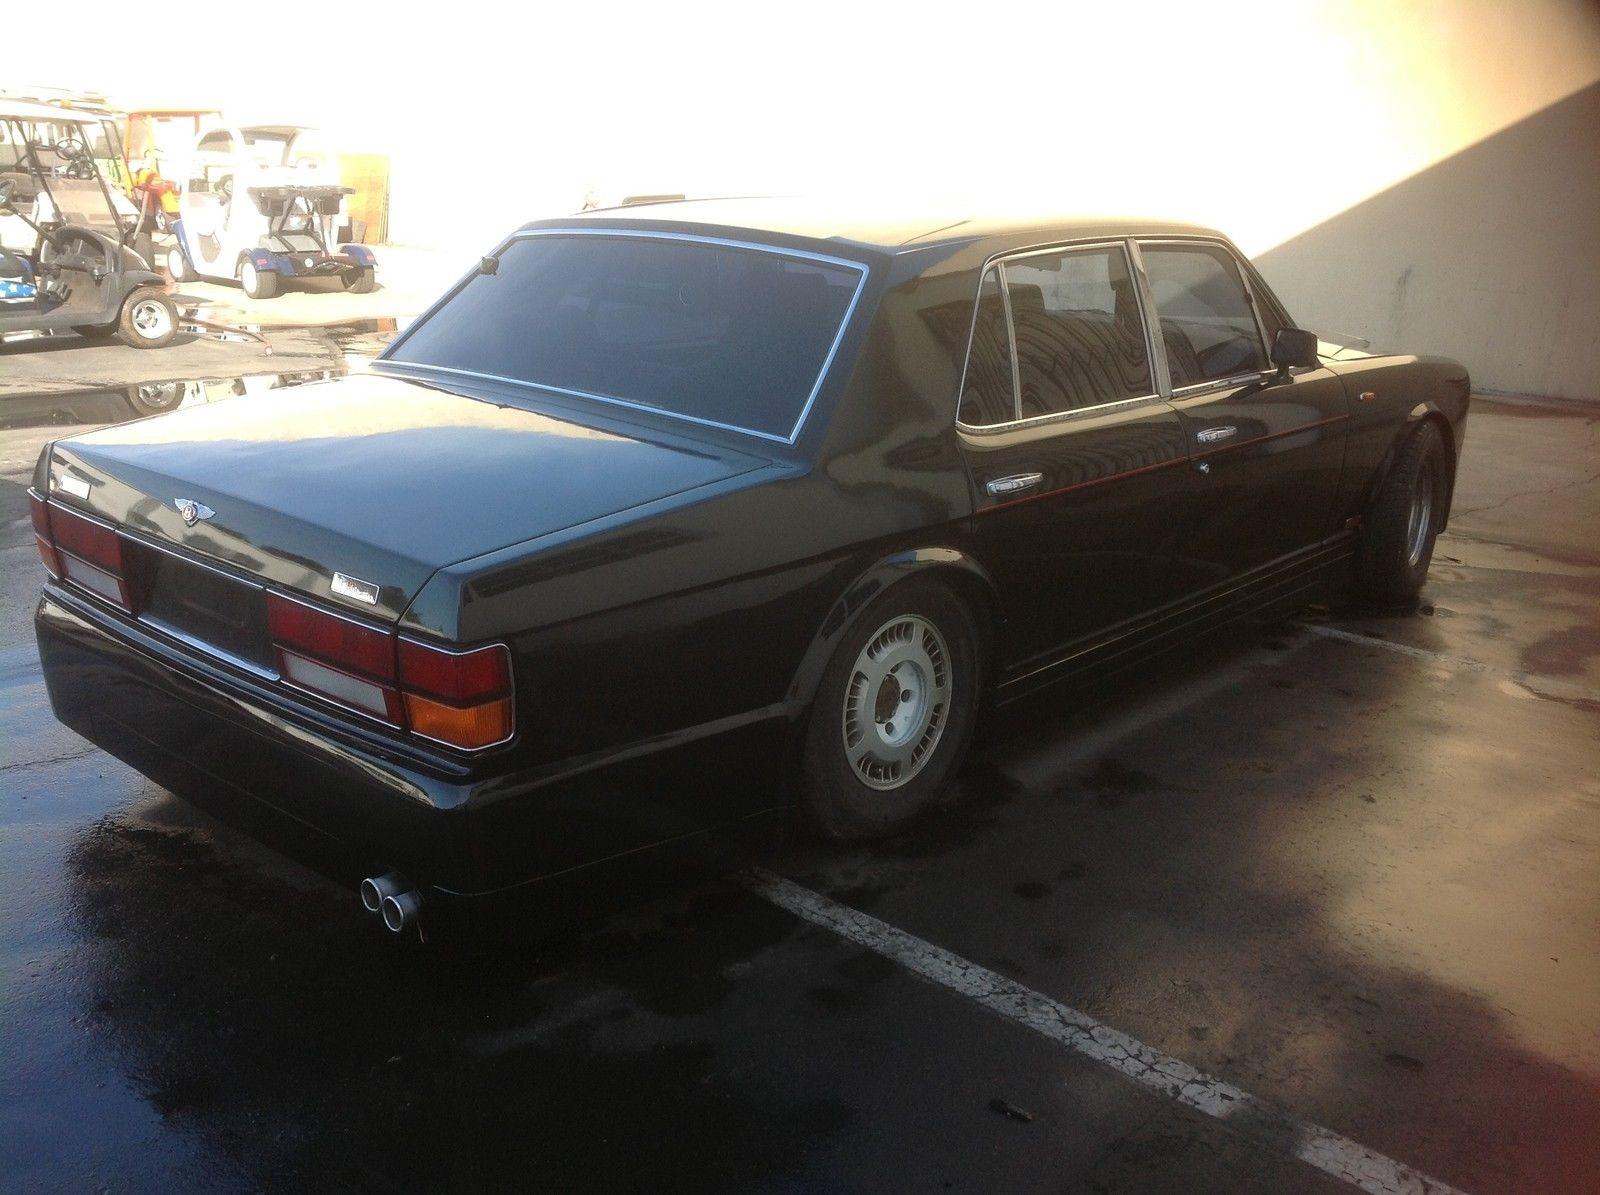 Bentley-Phantom-4%25255B2%25255D.jpg